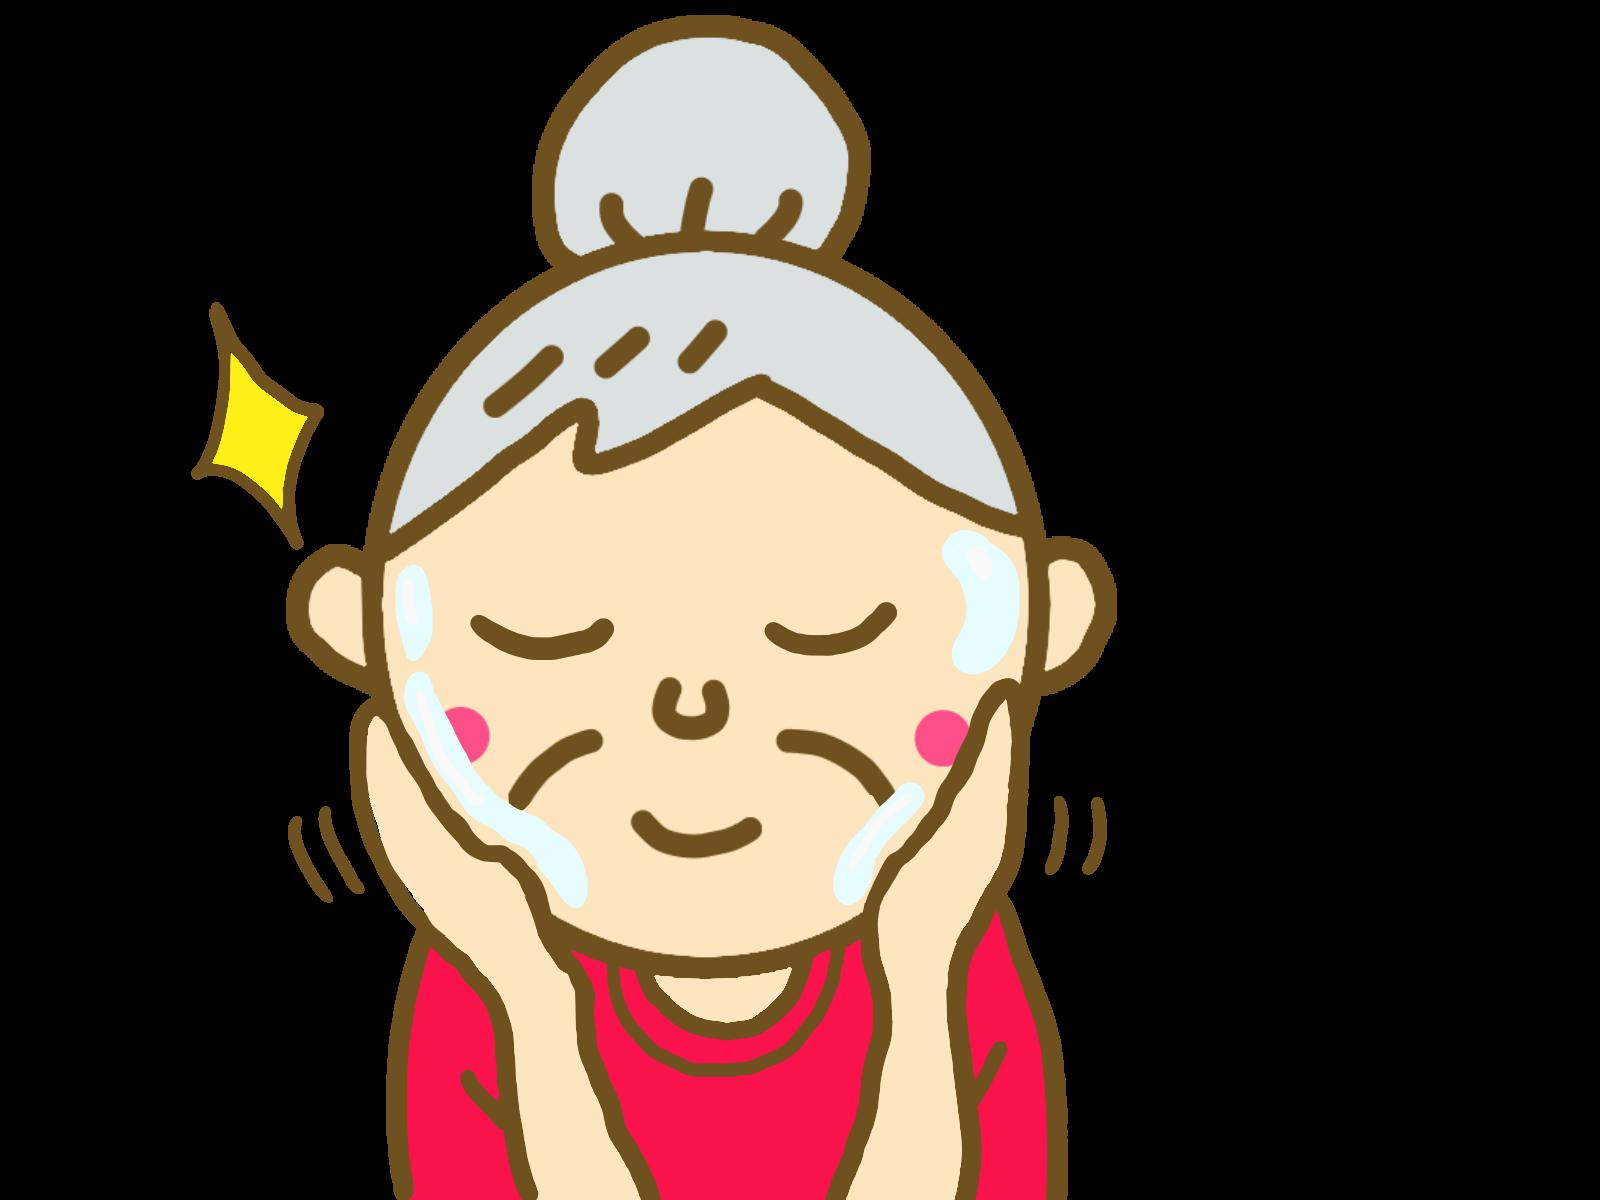 高齢者化粧療法認知症予防秋田介護施設デイサービス